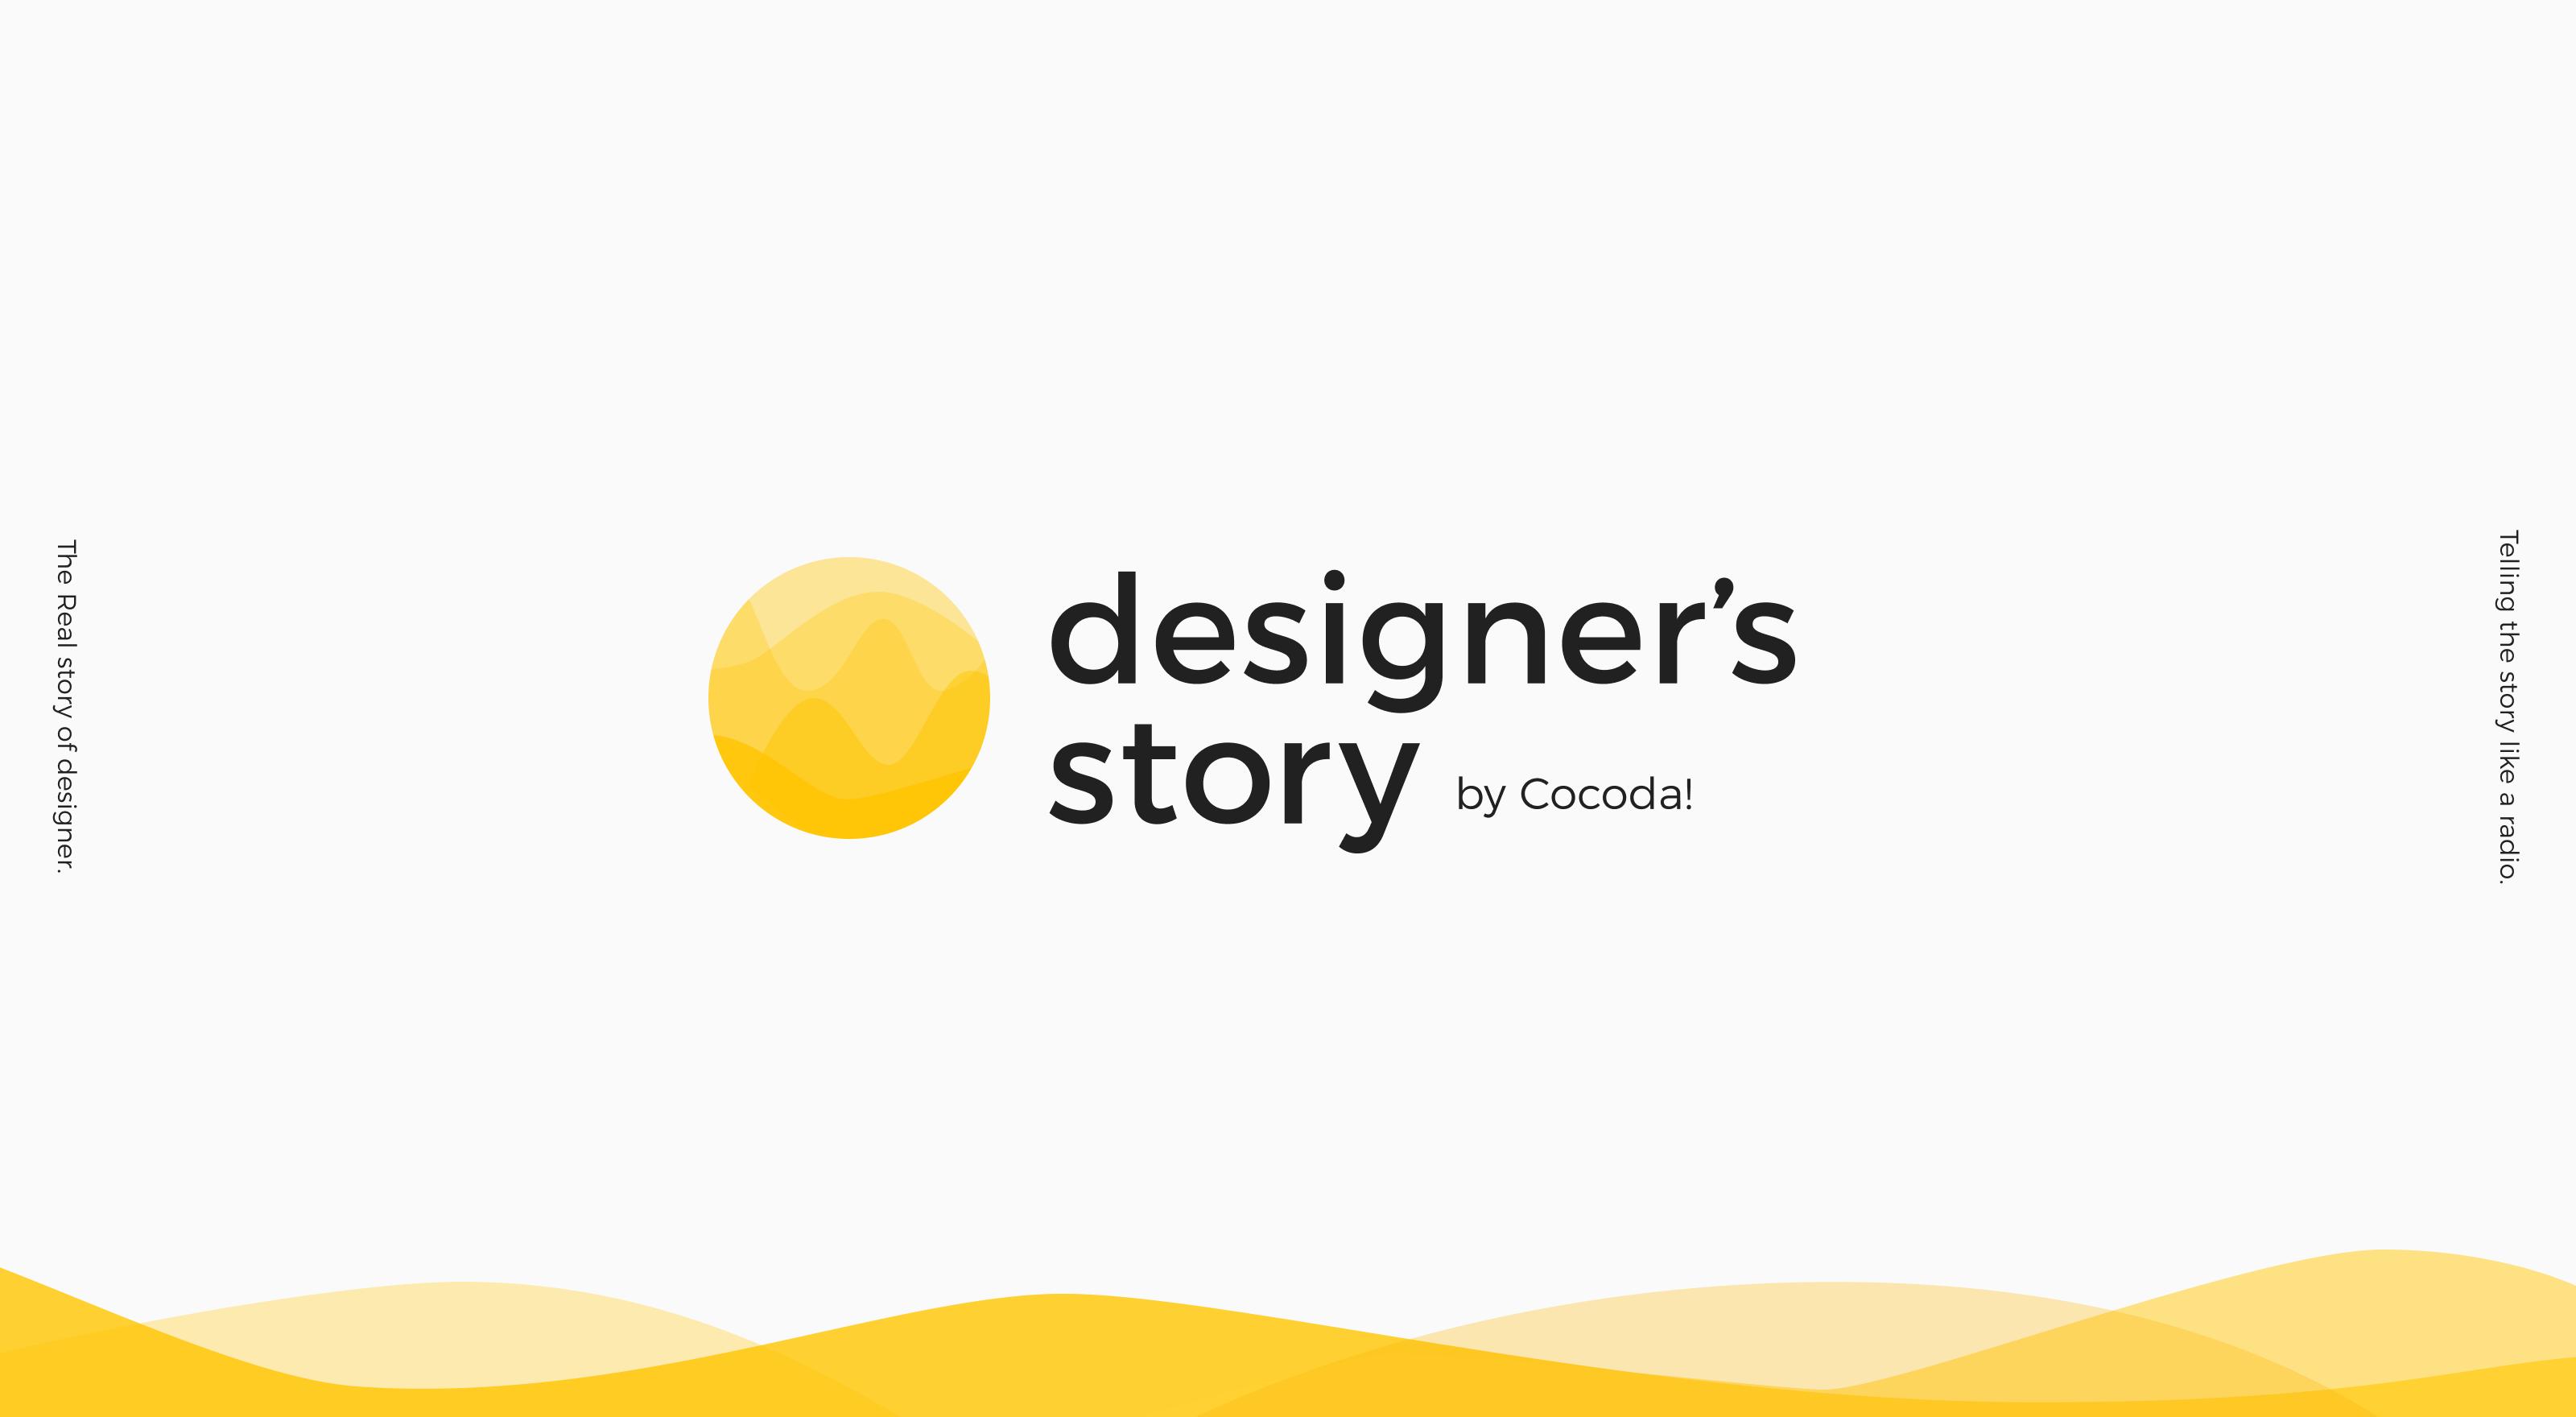 Designer's Story by Cocoda ロゴデザインのサムネイル画像